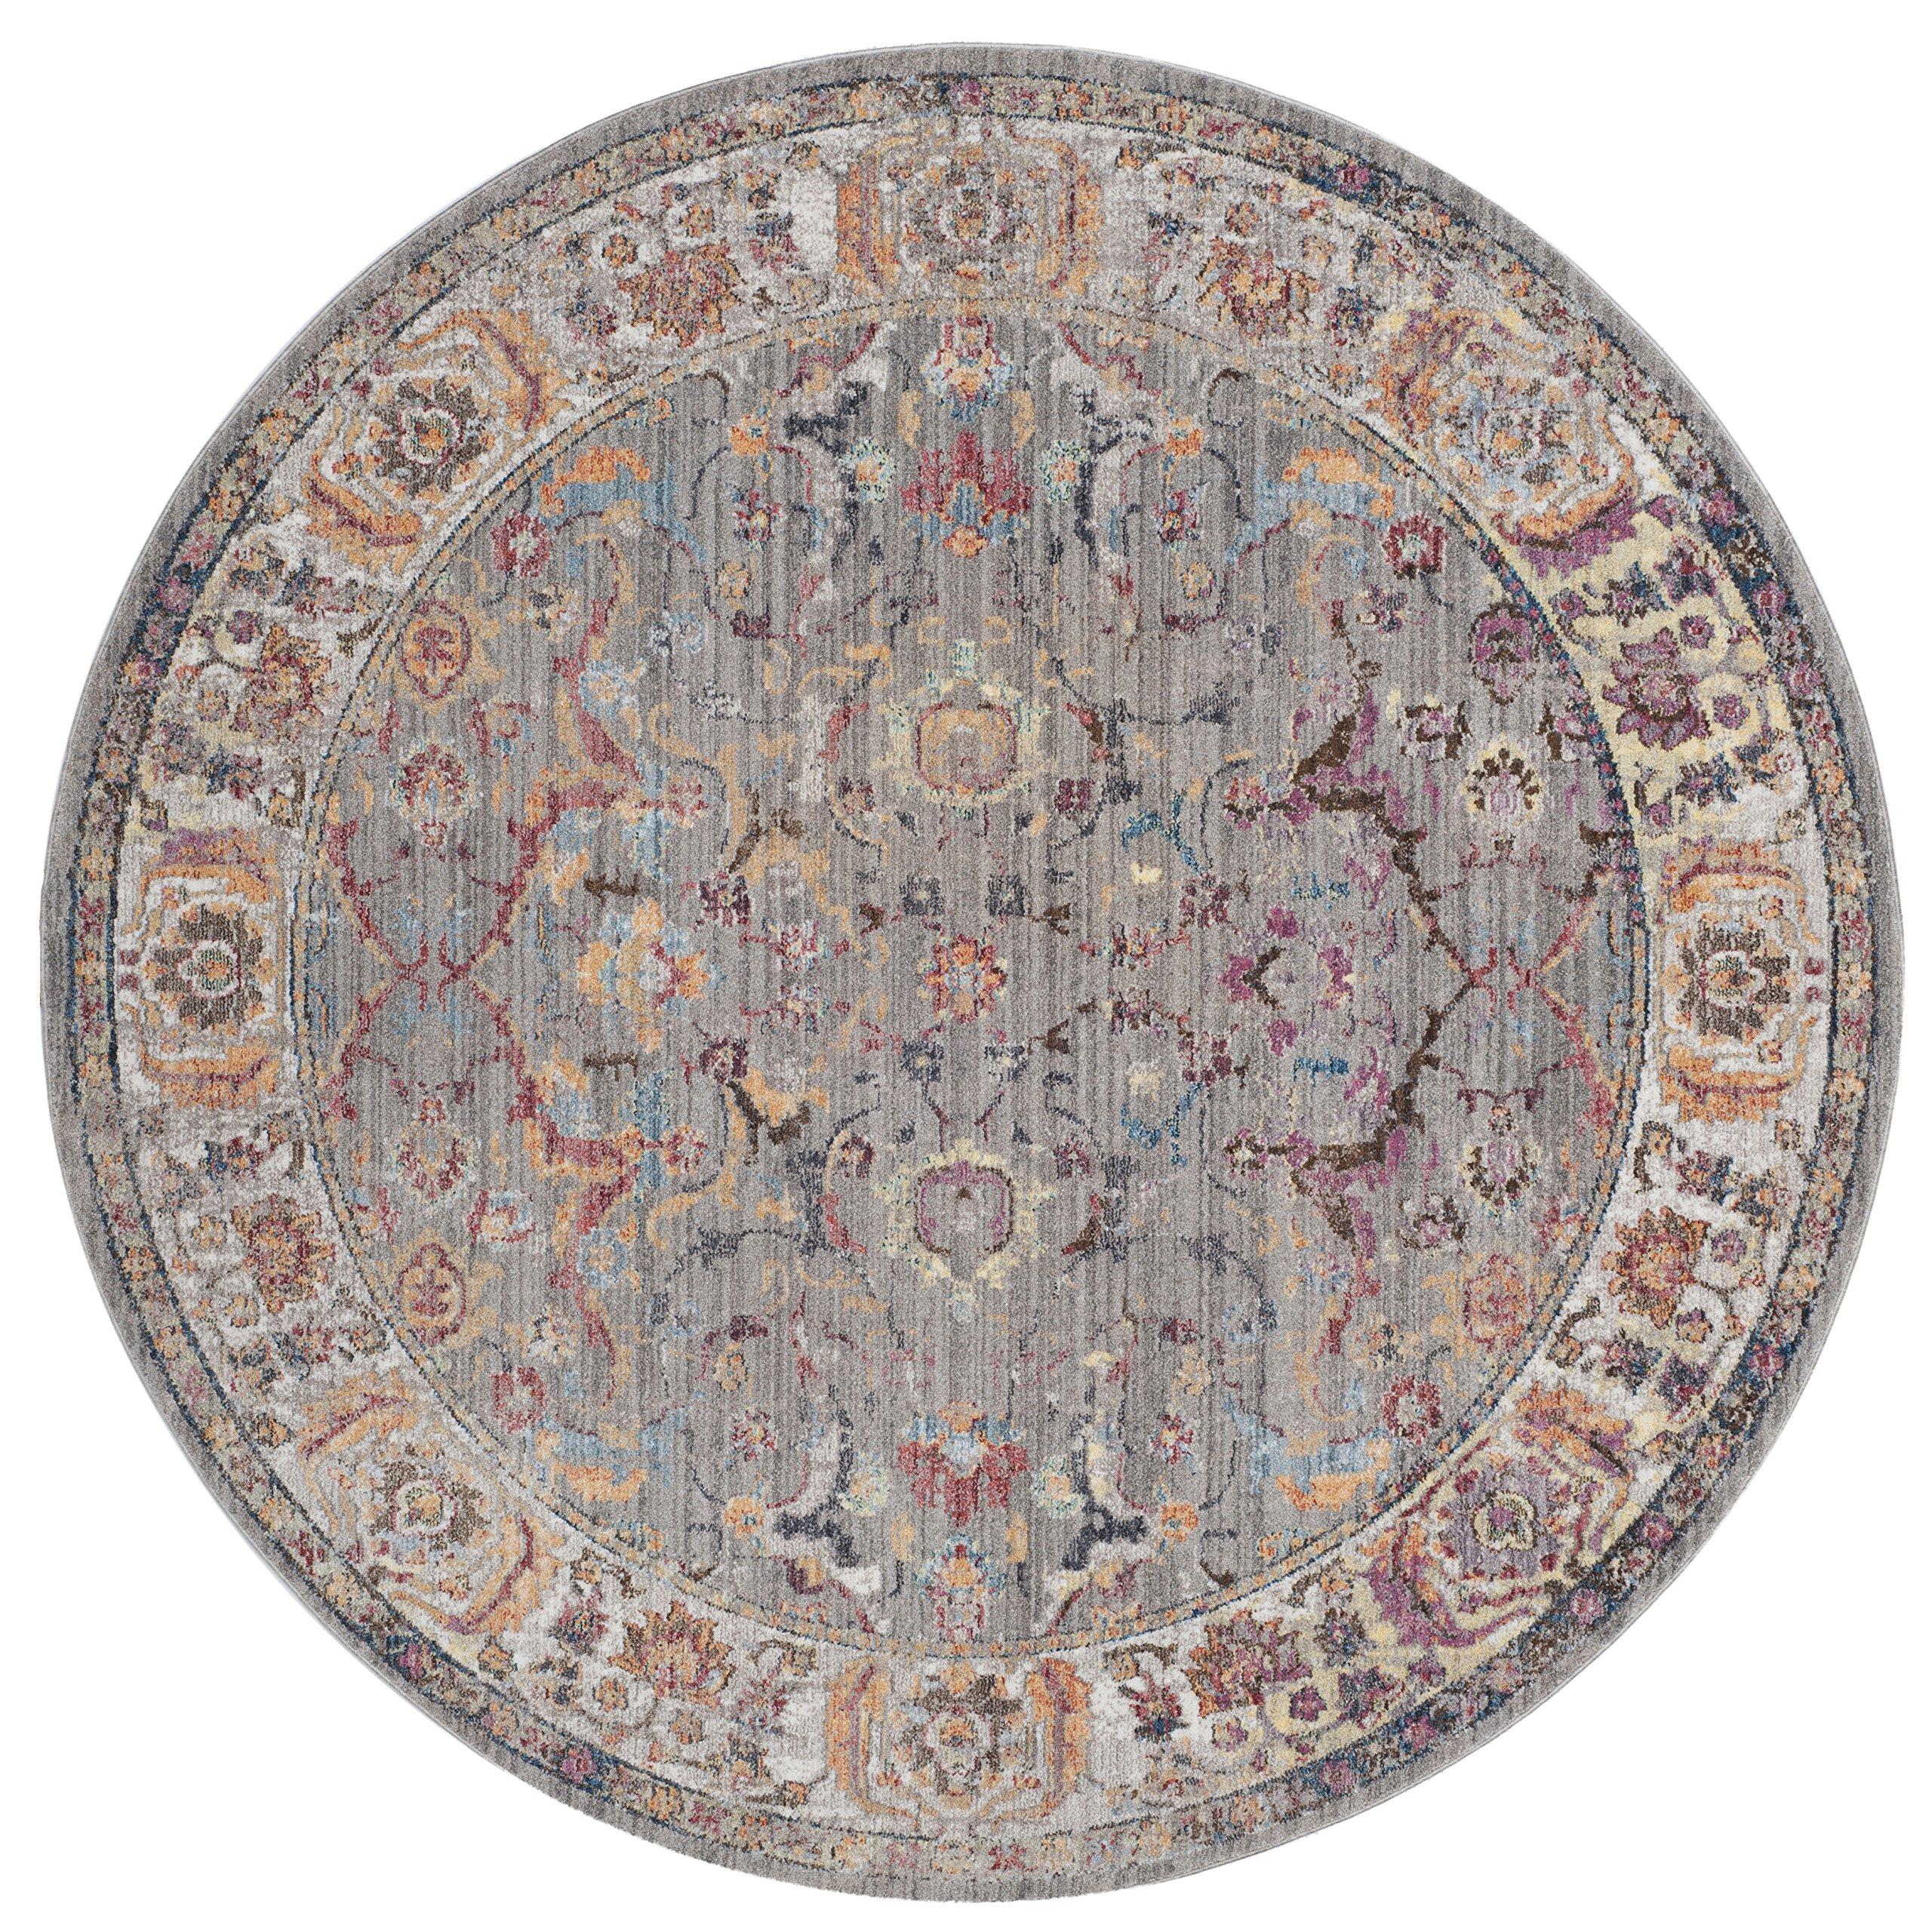 Safavieh Bristol Collection BTL362A Grey and Light Grey Vintage Oriental Distressed Round Area Rug (7' Diameter)